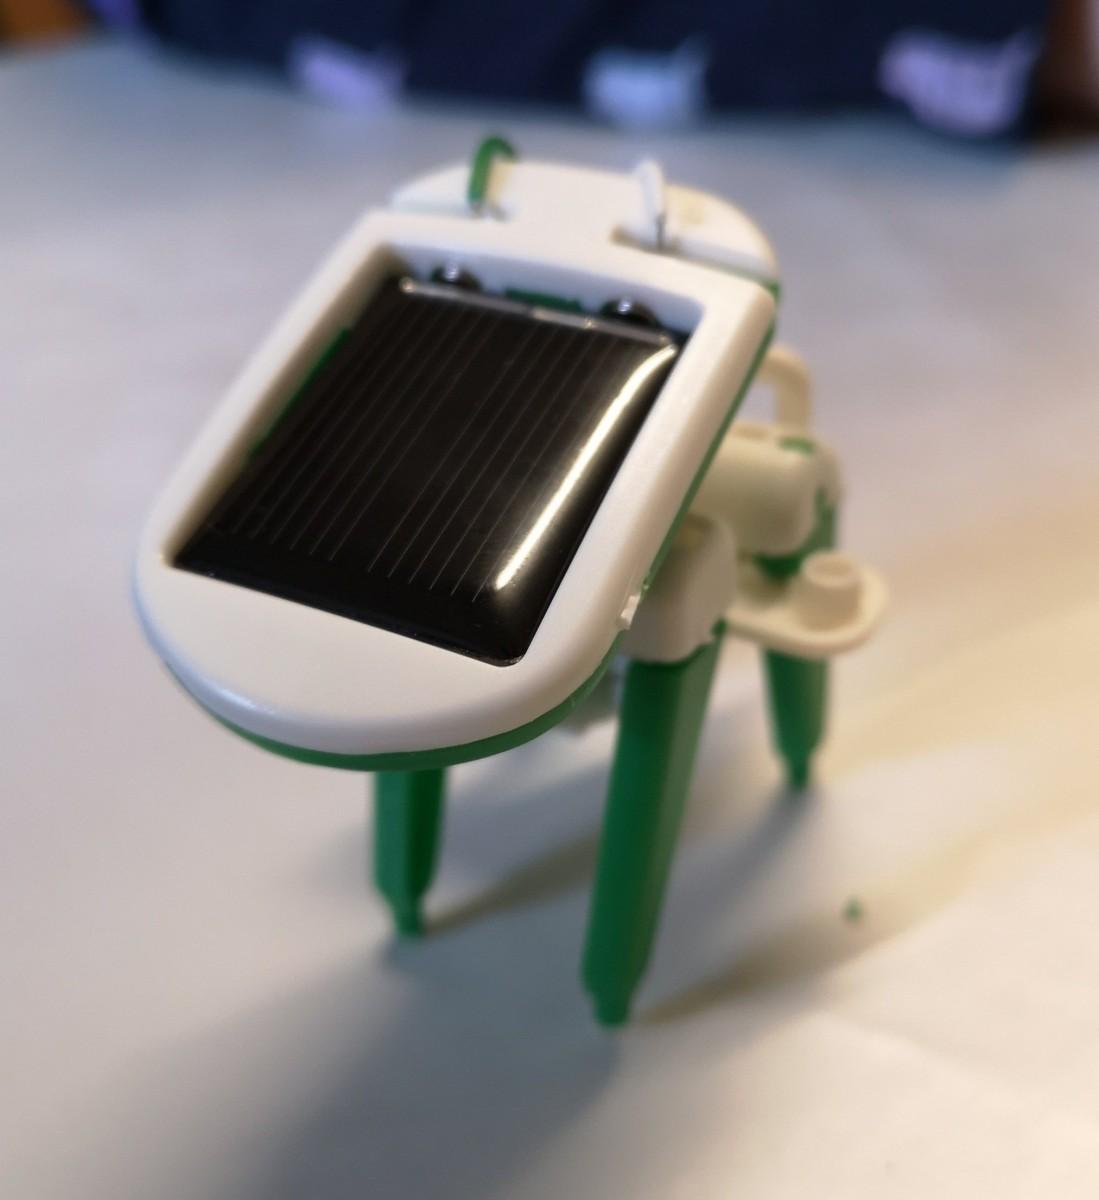 Solar puppy